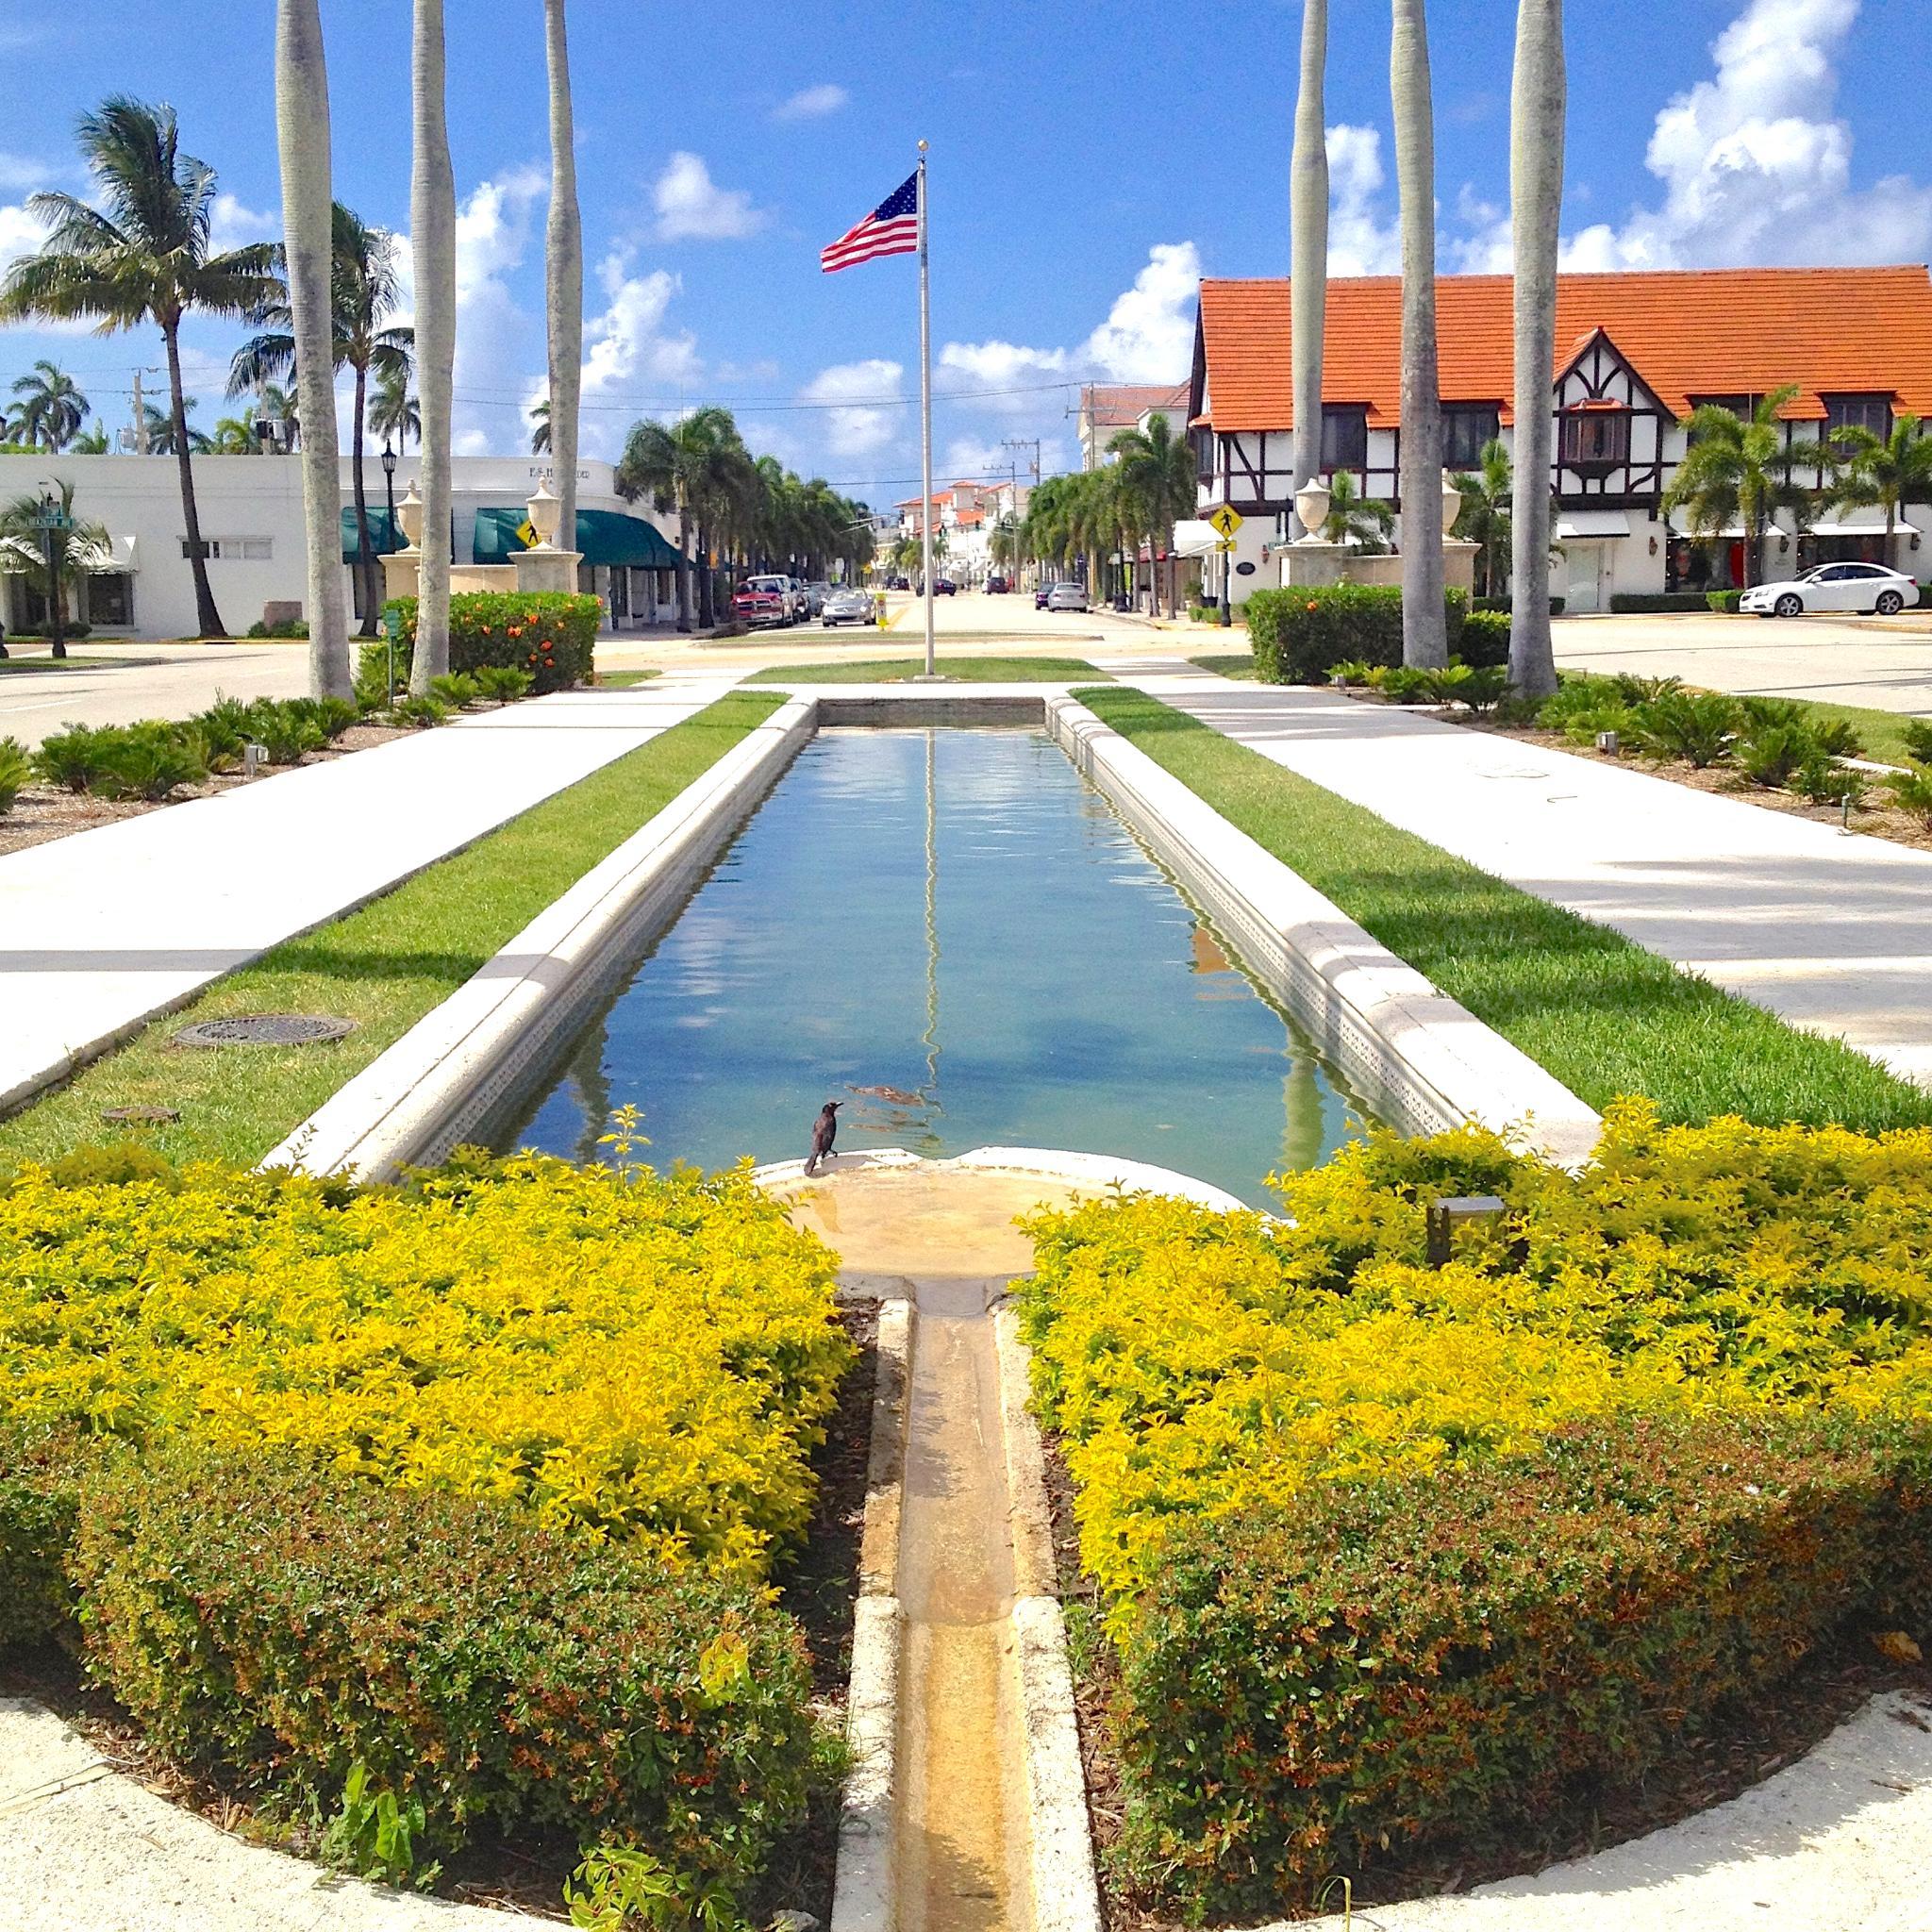 West Palm Beach by marianne250